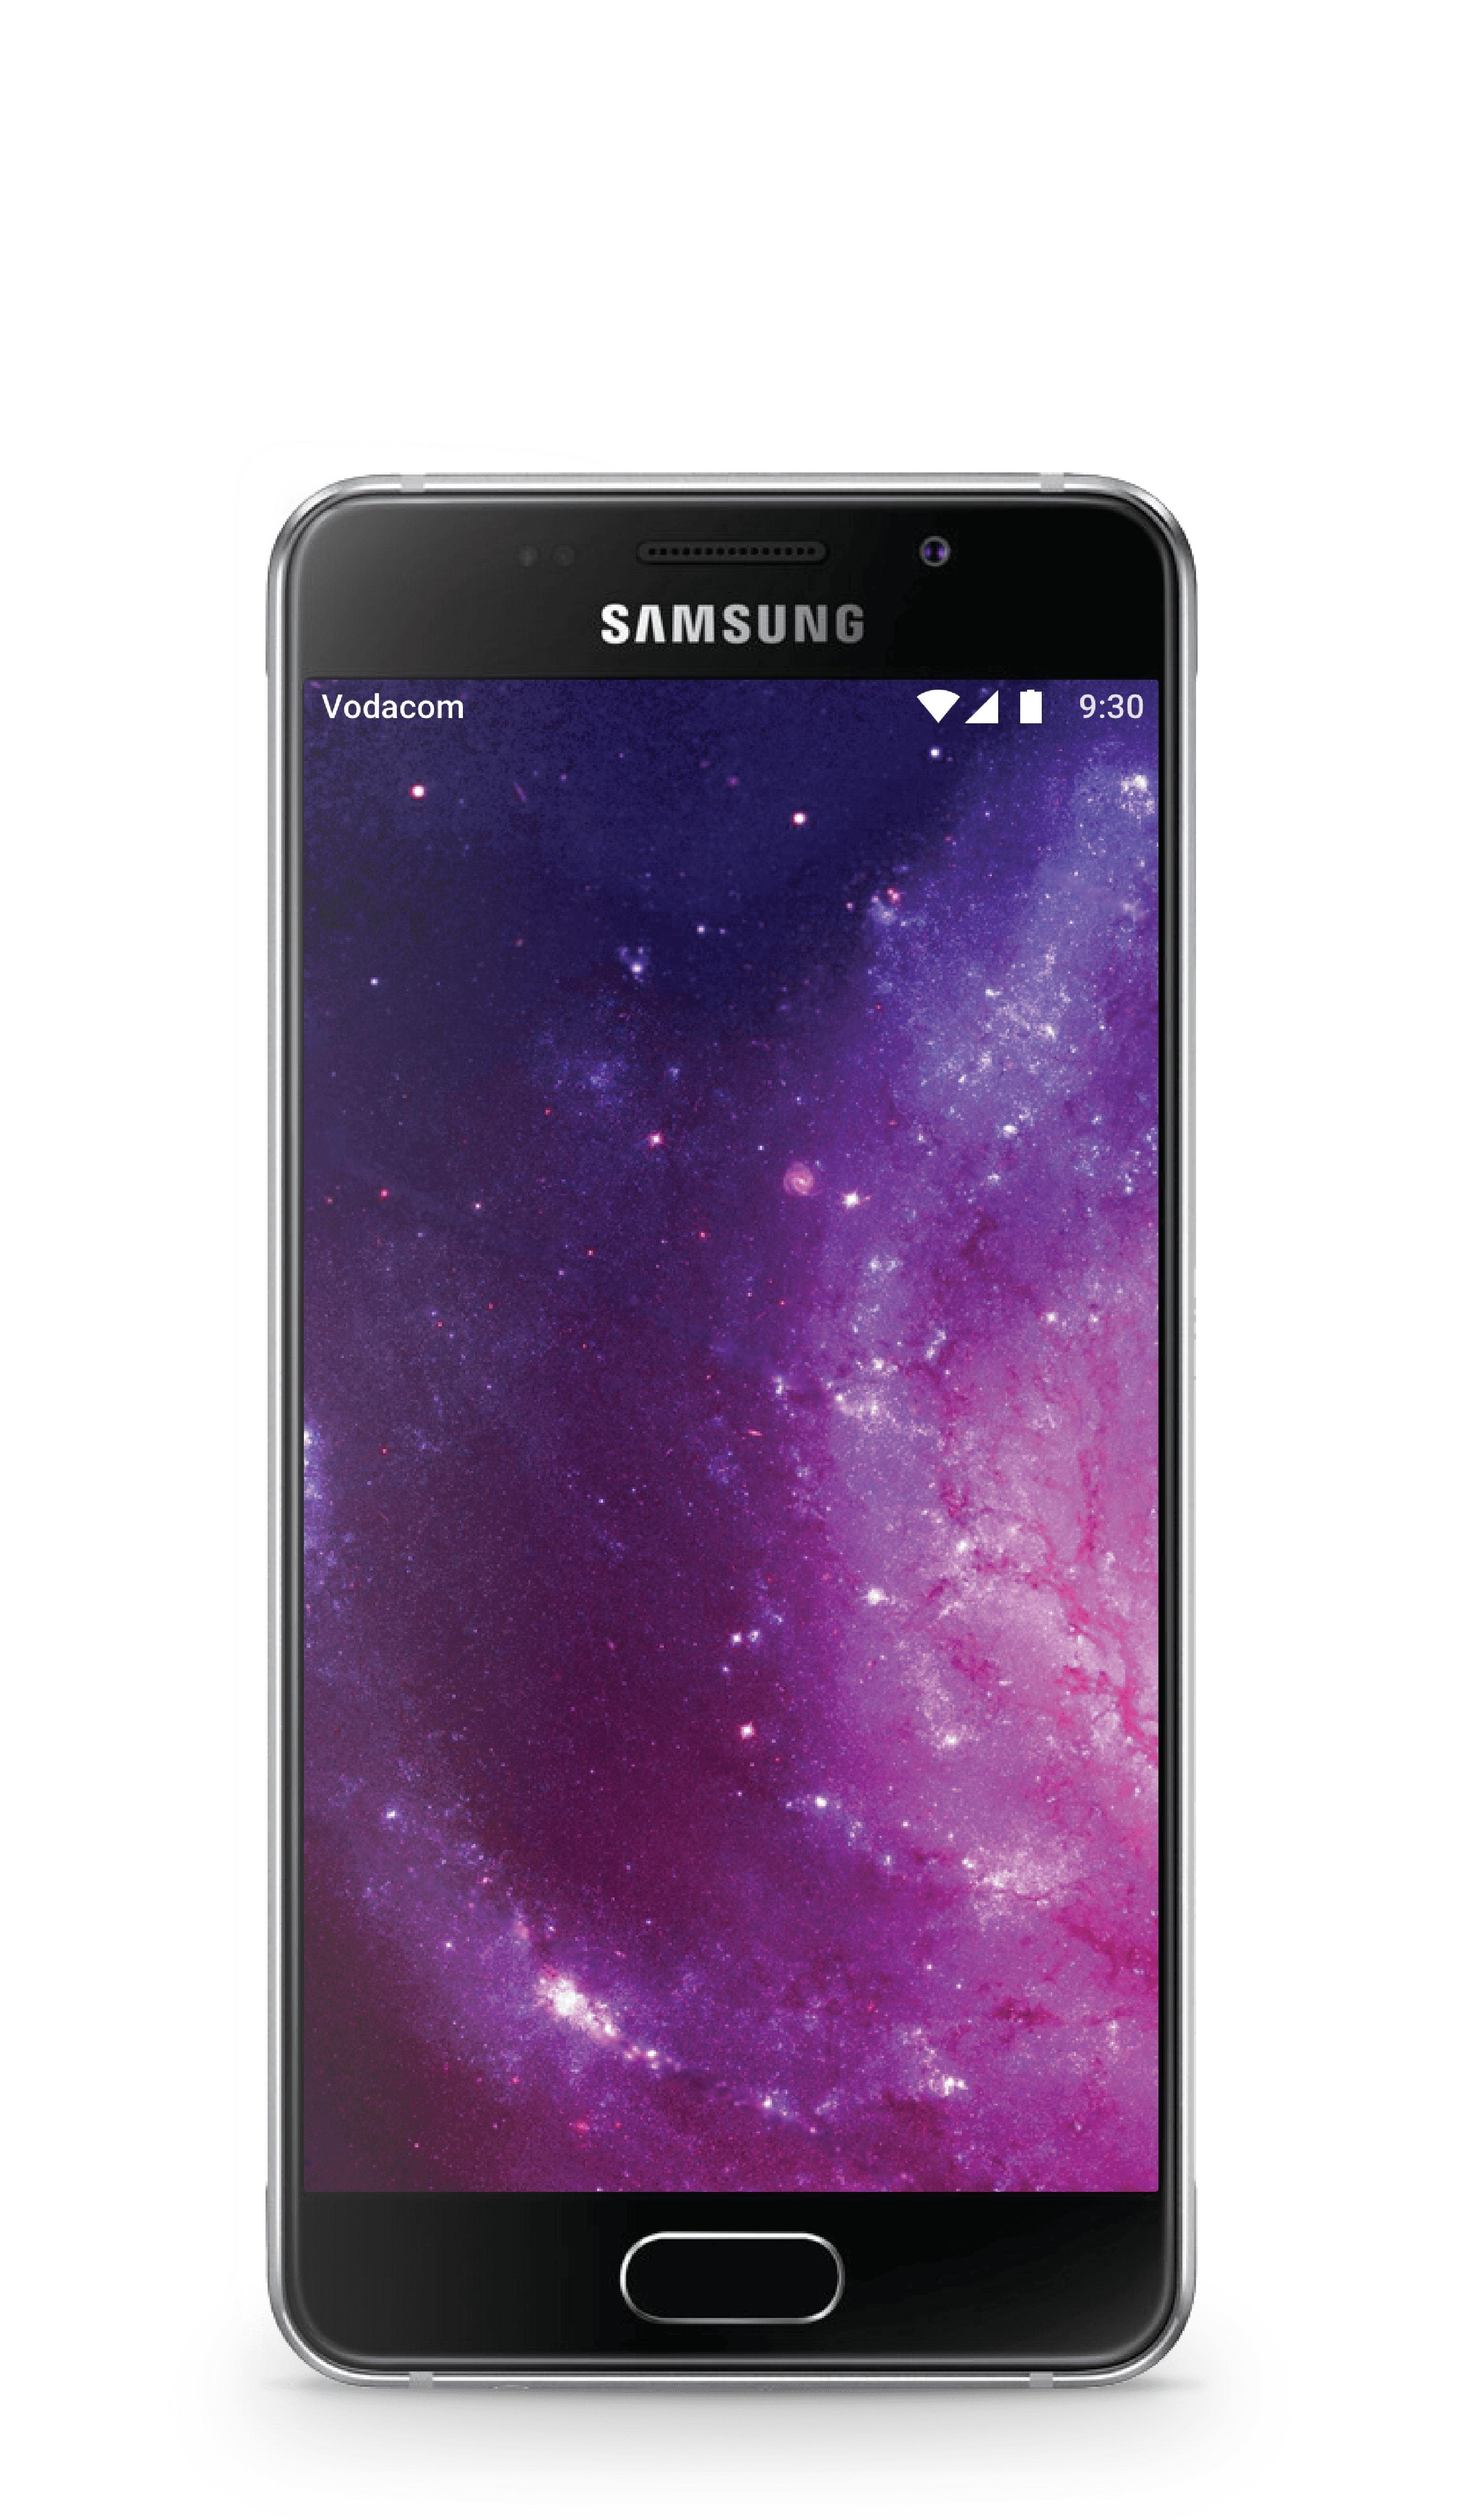 Samsung Galaxy A3 (2016) image